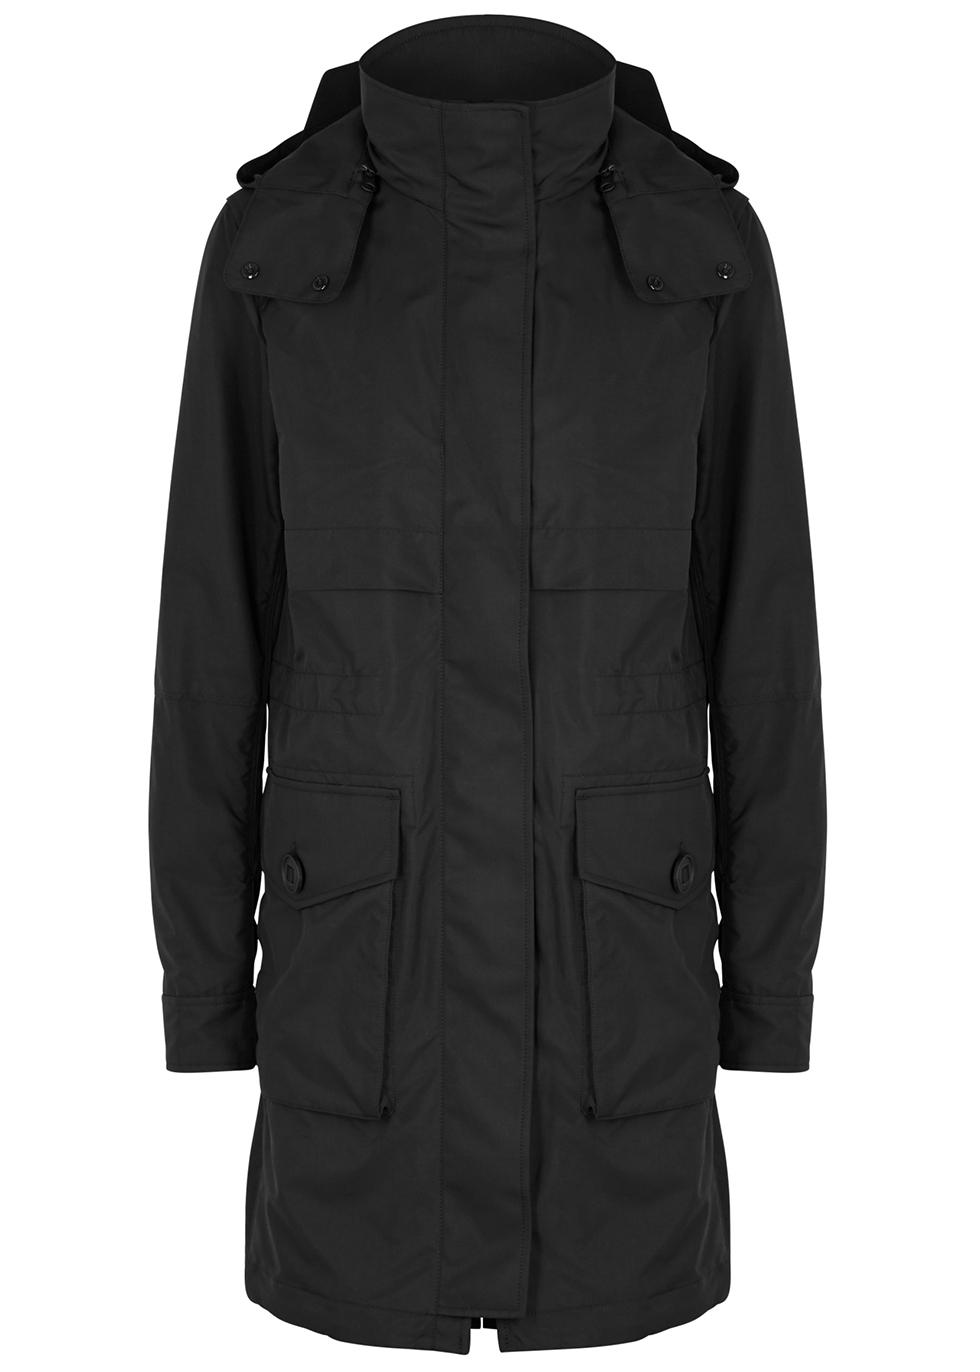 1653549e6eb85 Canada Goose - Designer Jackets   Coats - Harvey Nichols